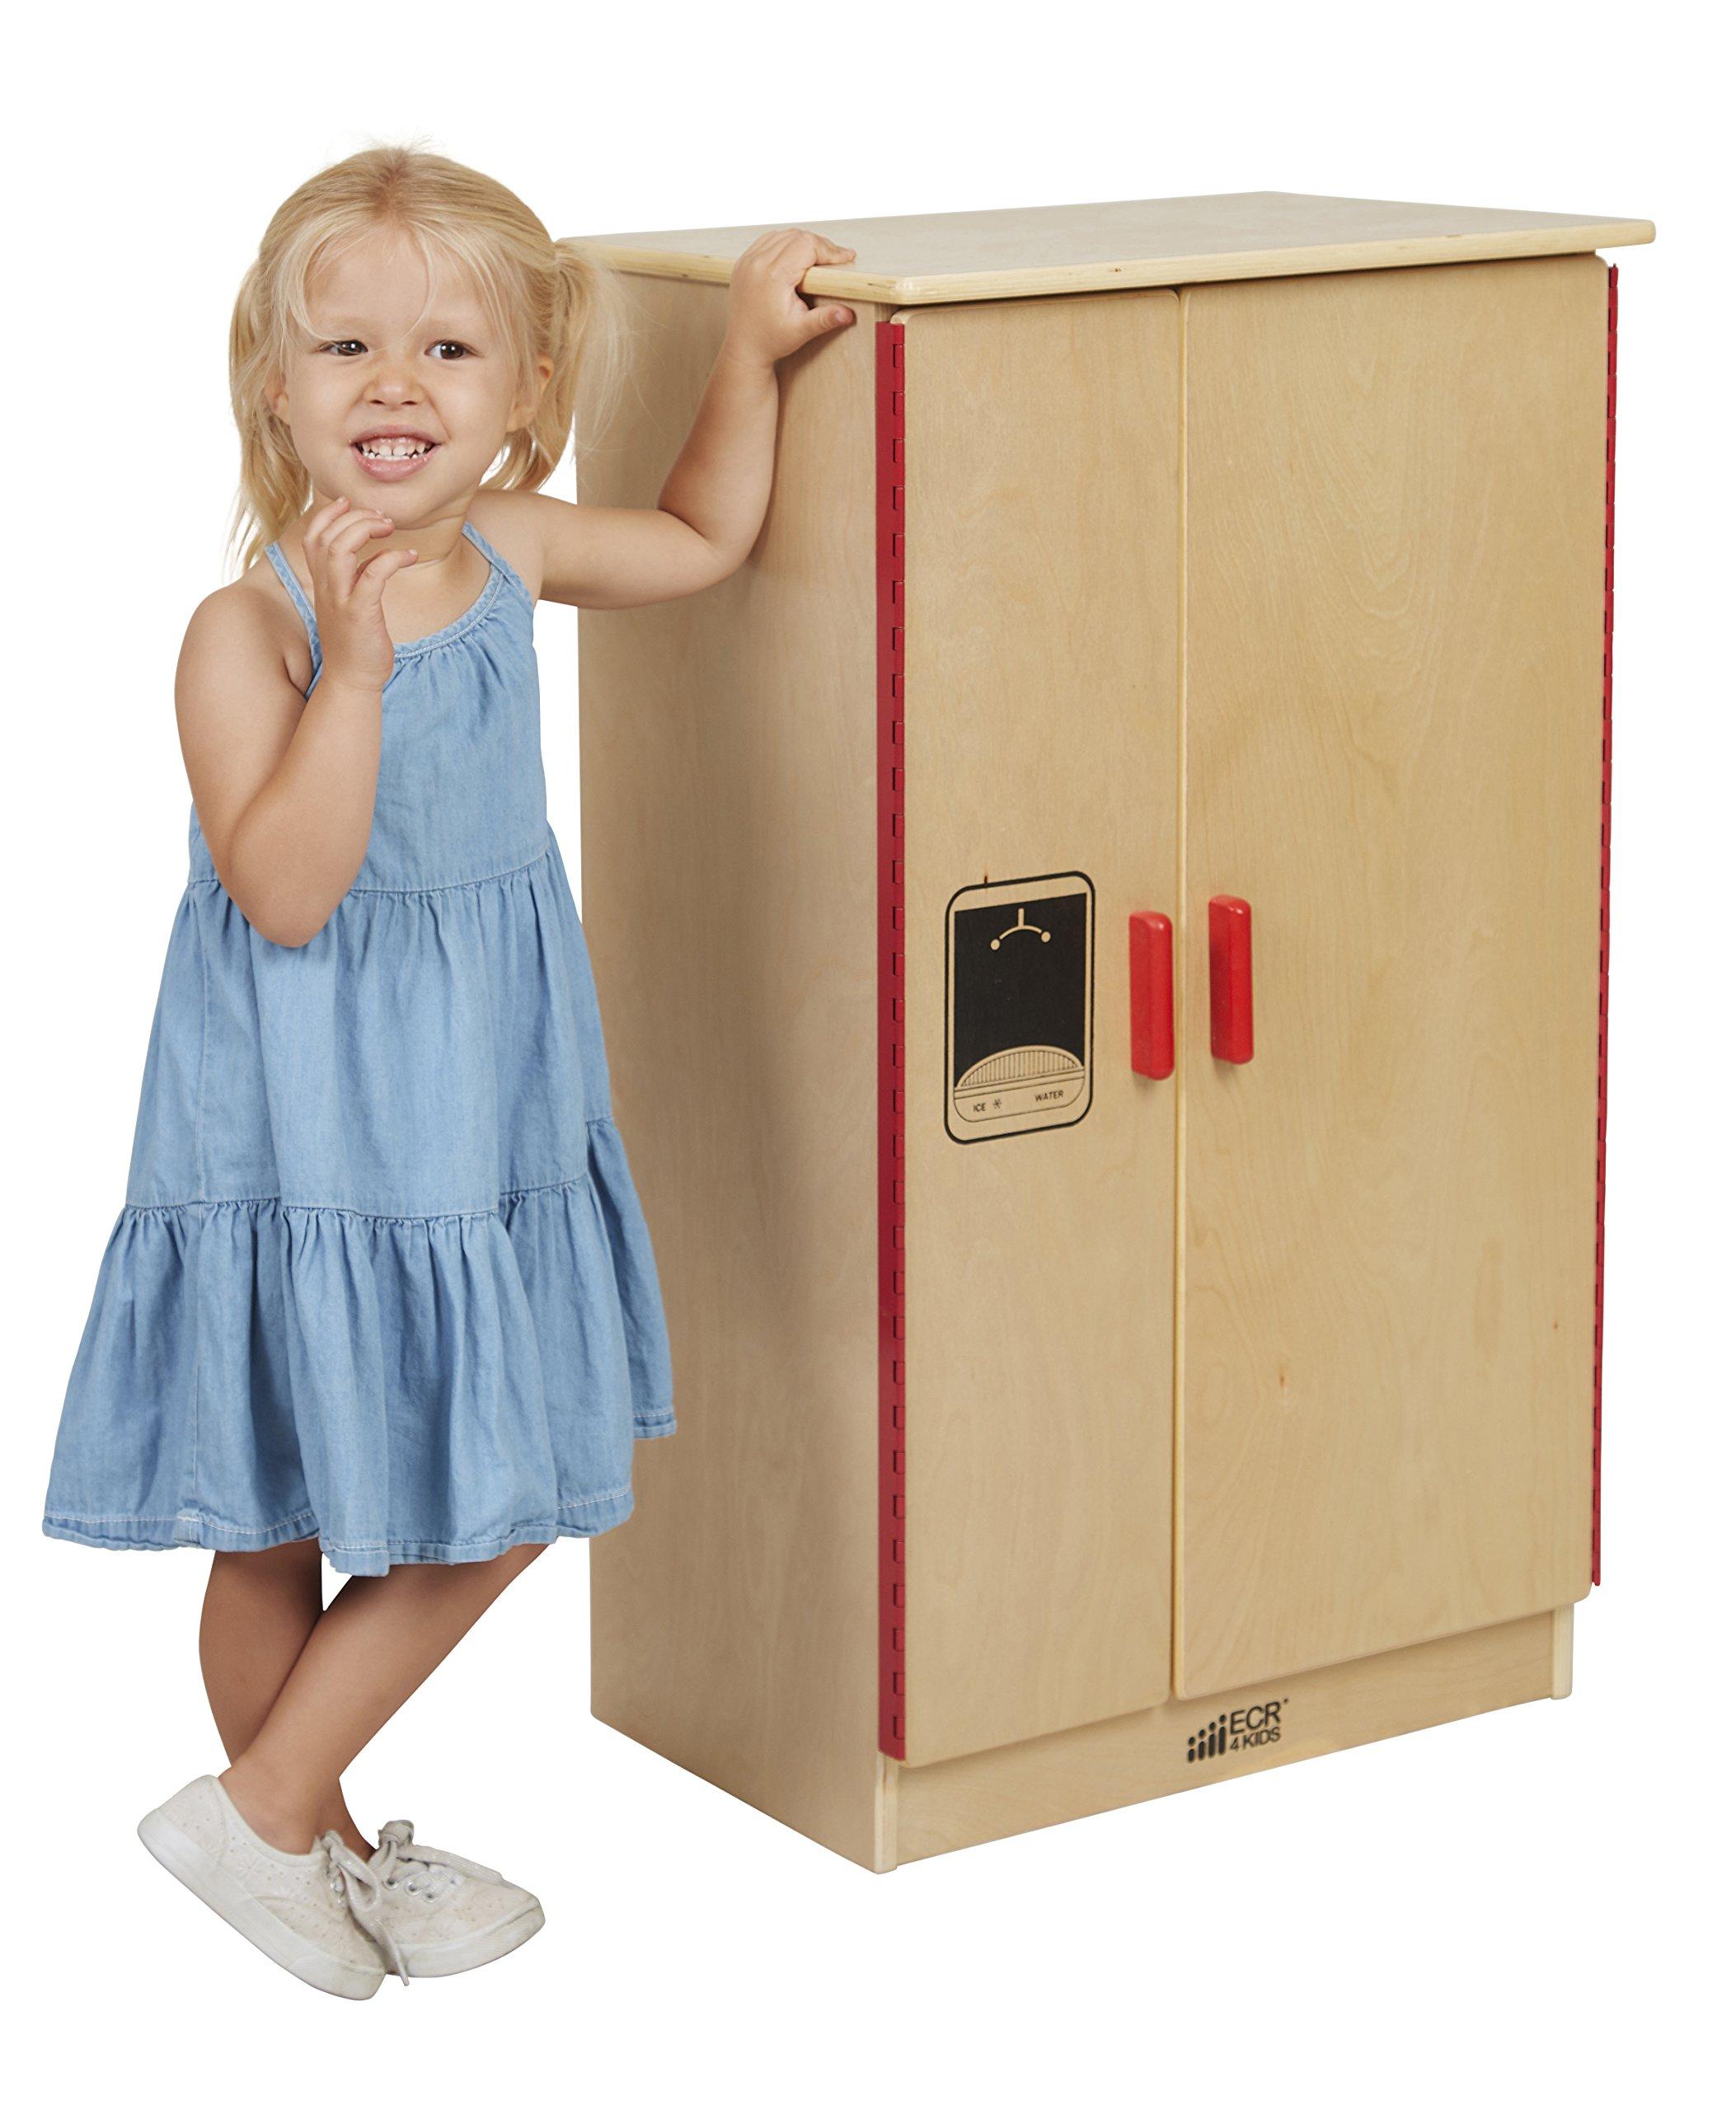 ECR4Kids Birch Pretend Play Kitchen Refrigerator Playset for Daycare, Natural